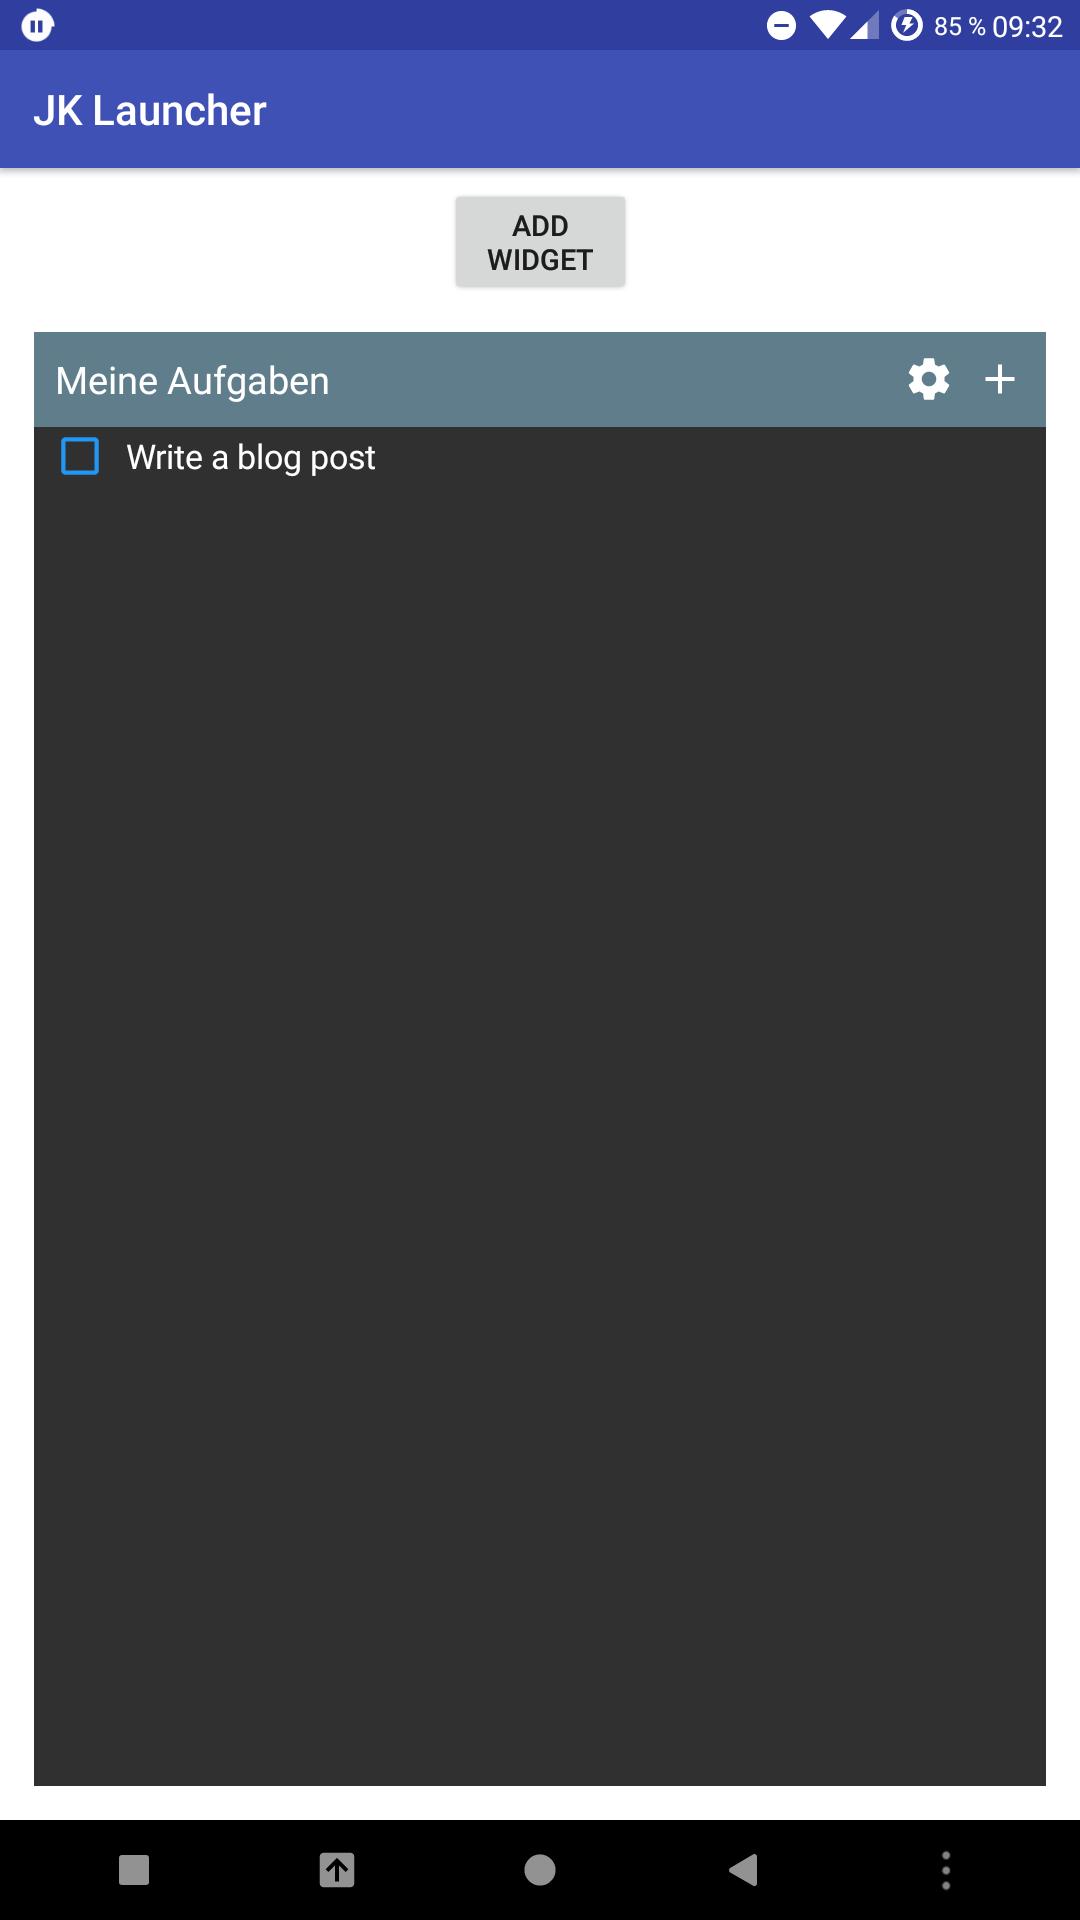 WidgetScreen